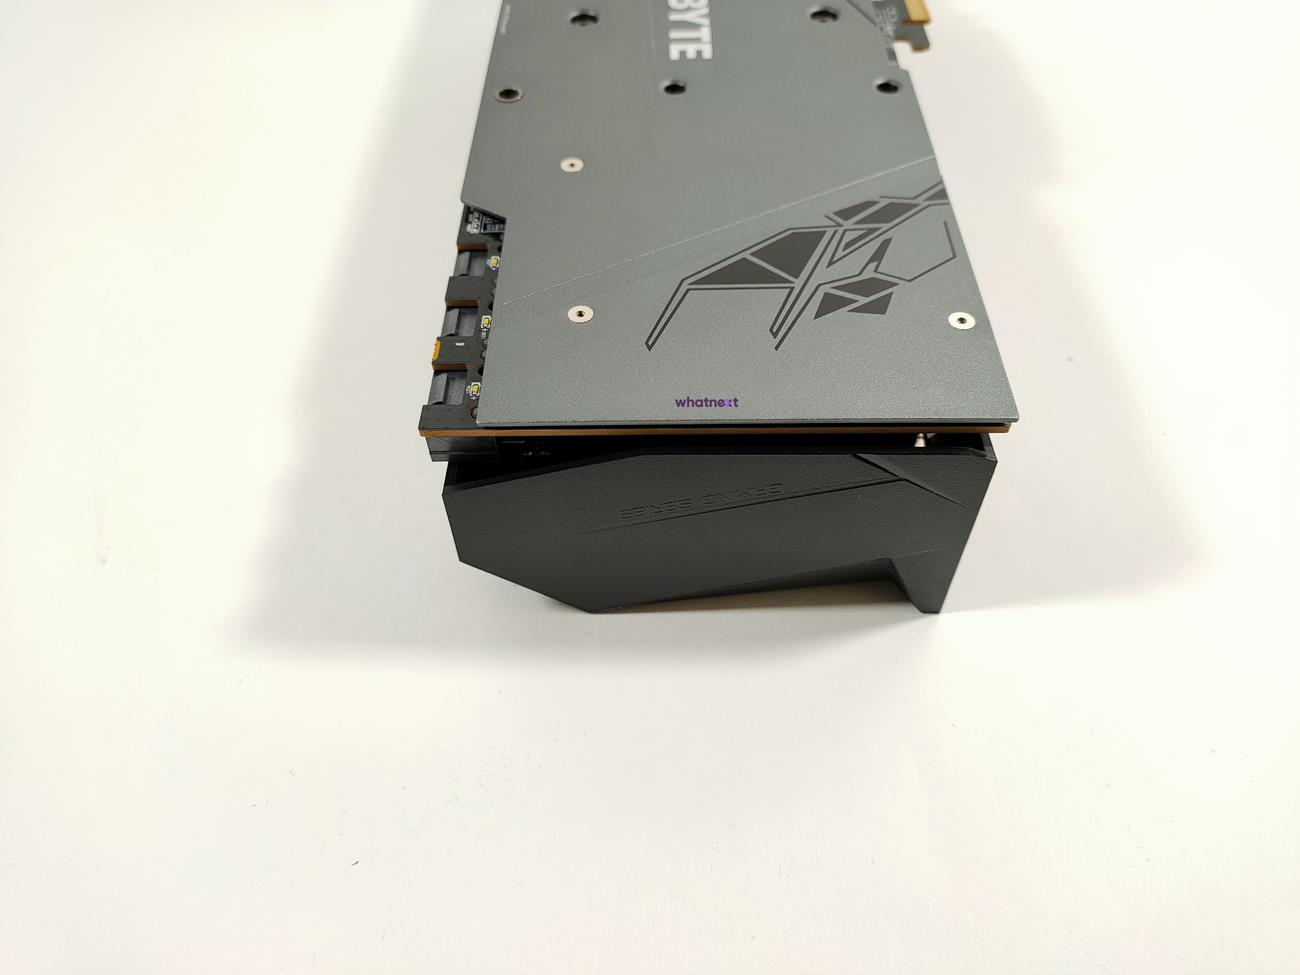 test Gigabyte Radeon RX 6900 XT Gaming OC 16G, recenzja Gigabyte Radeon RX 6900 XT Gaming OC 16G, opinia Gigabyte Radeon RX 6900 XT Gaming OC 16G